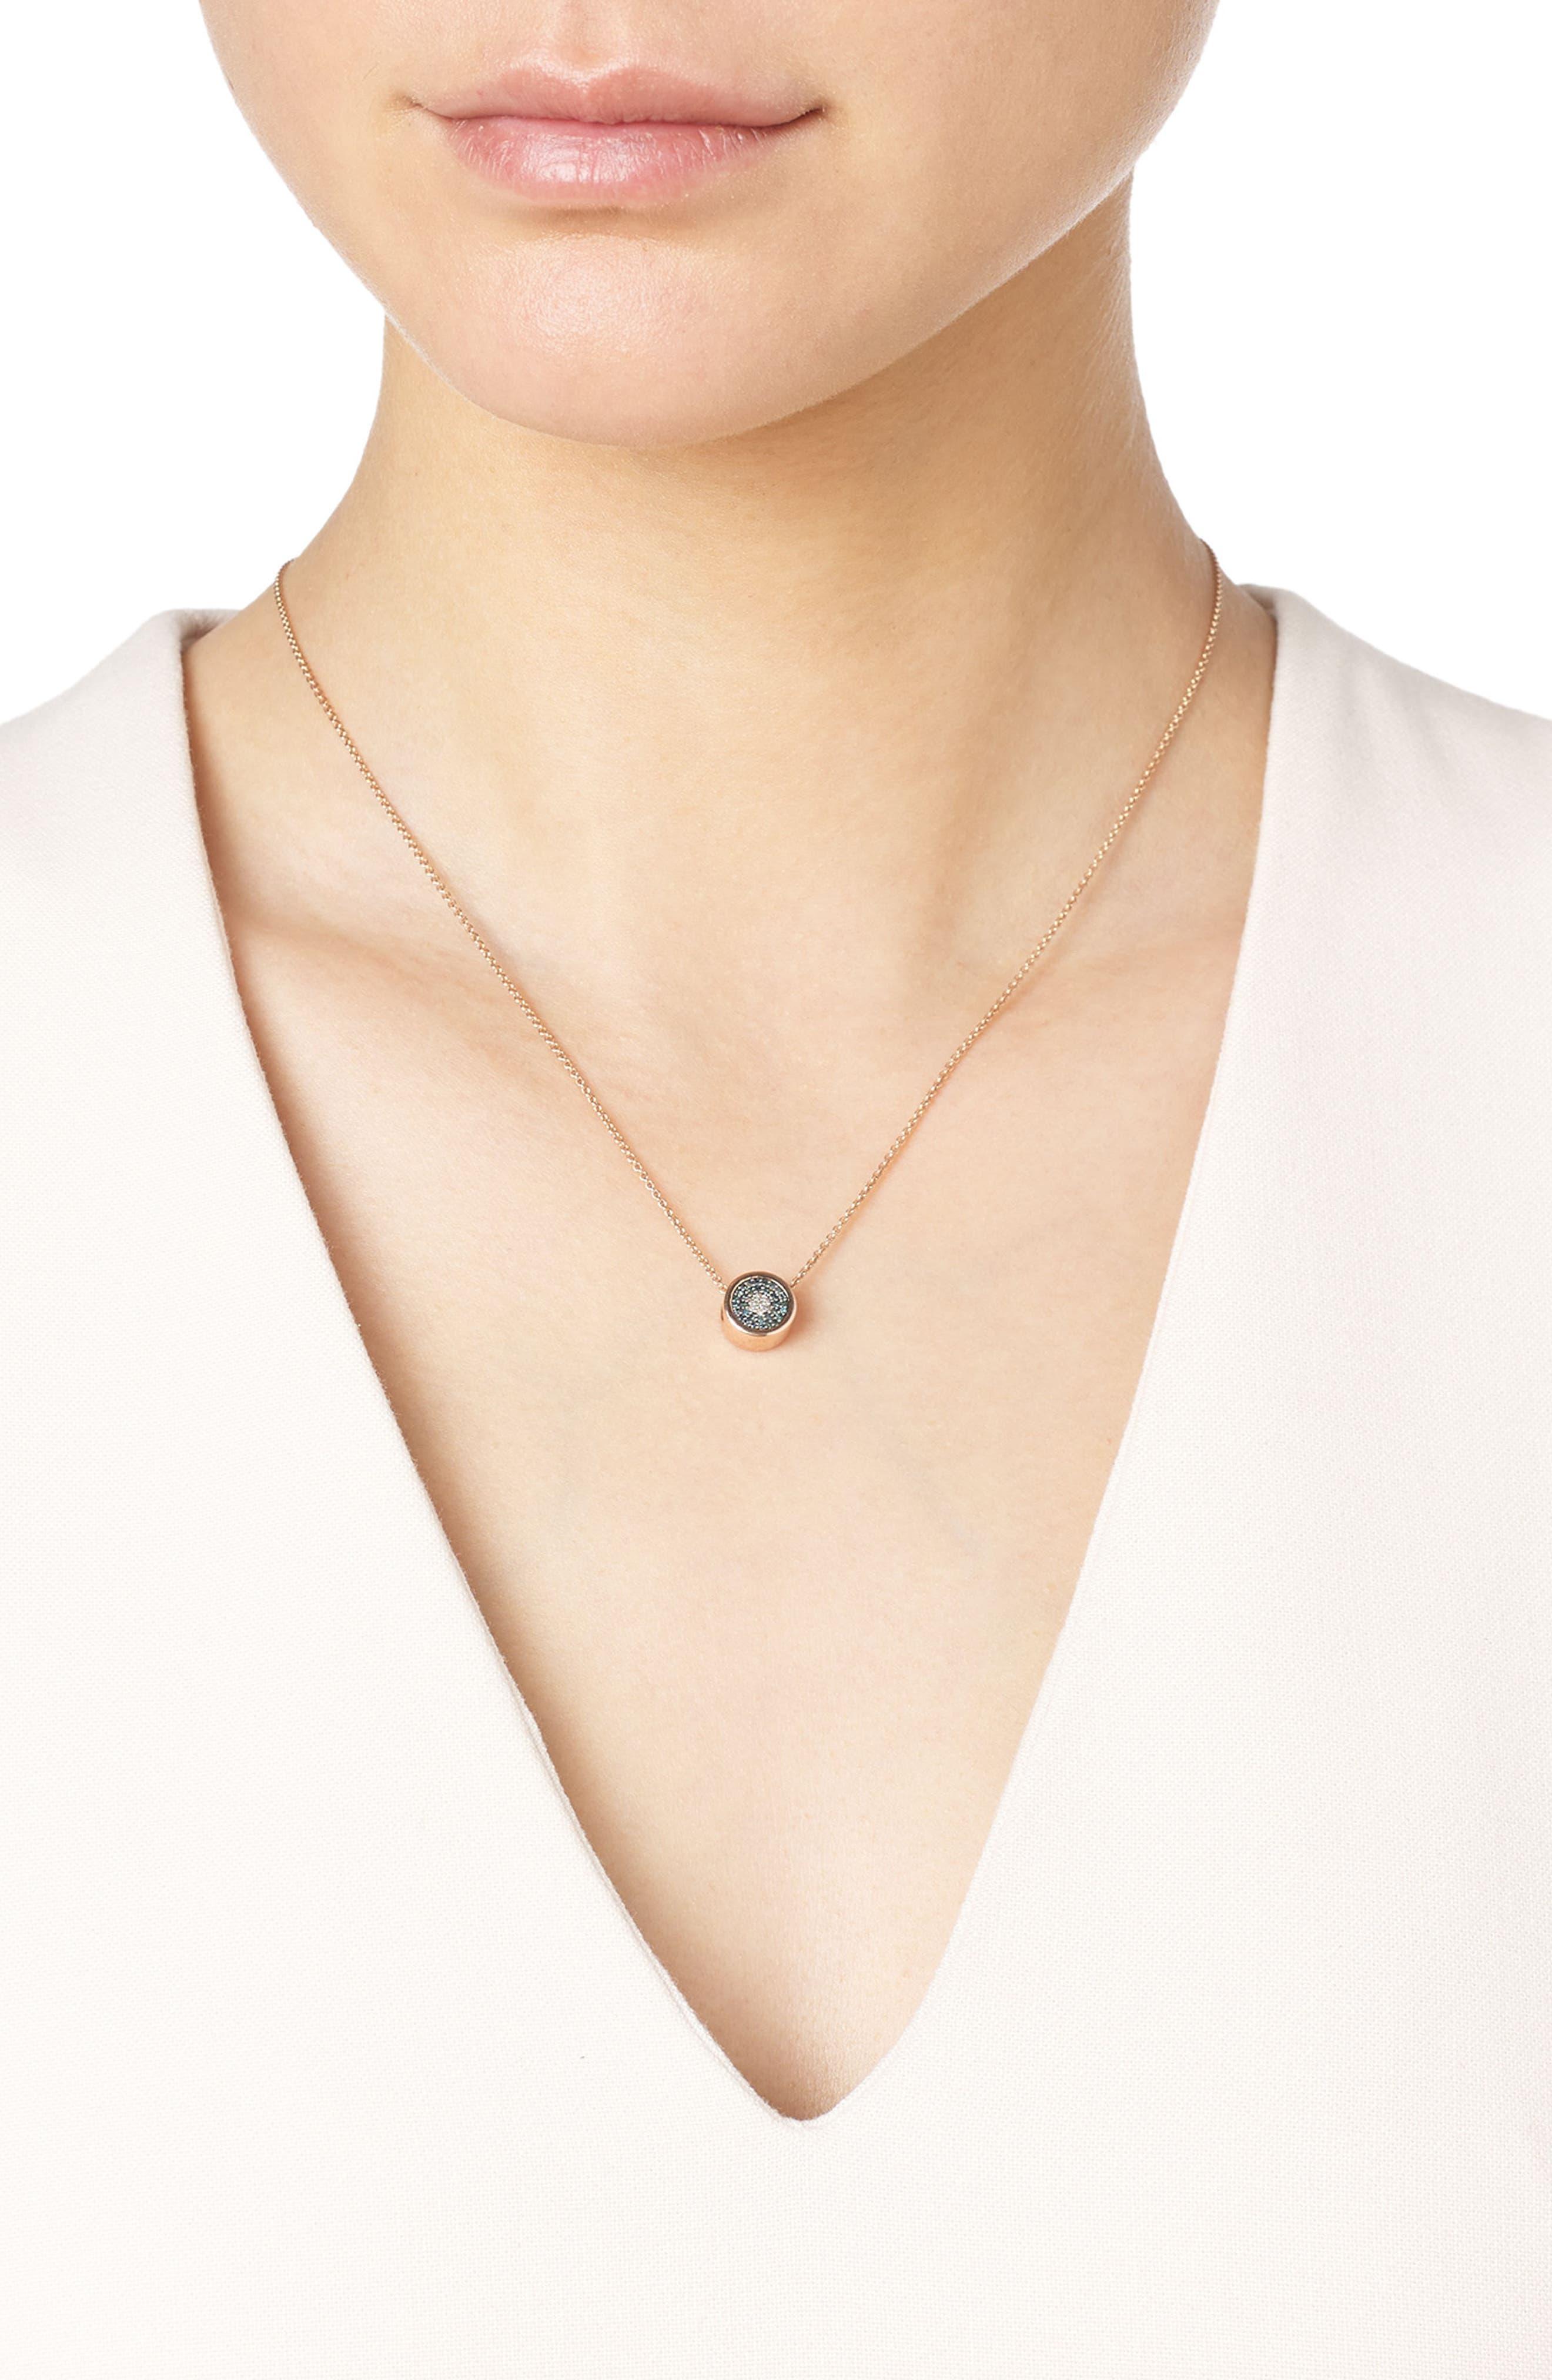 MONICA VINADER,                             Evil Eye Diamond Pendant Necklace,                             Alternate thumbnail 2, color,                             ROSE GOLD/ DIAMOND